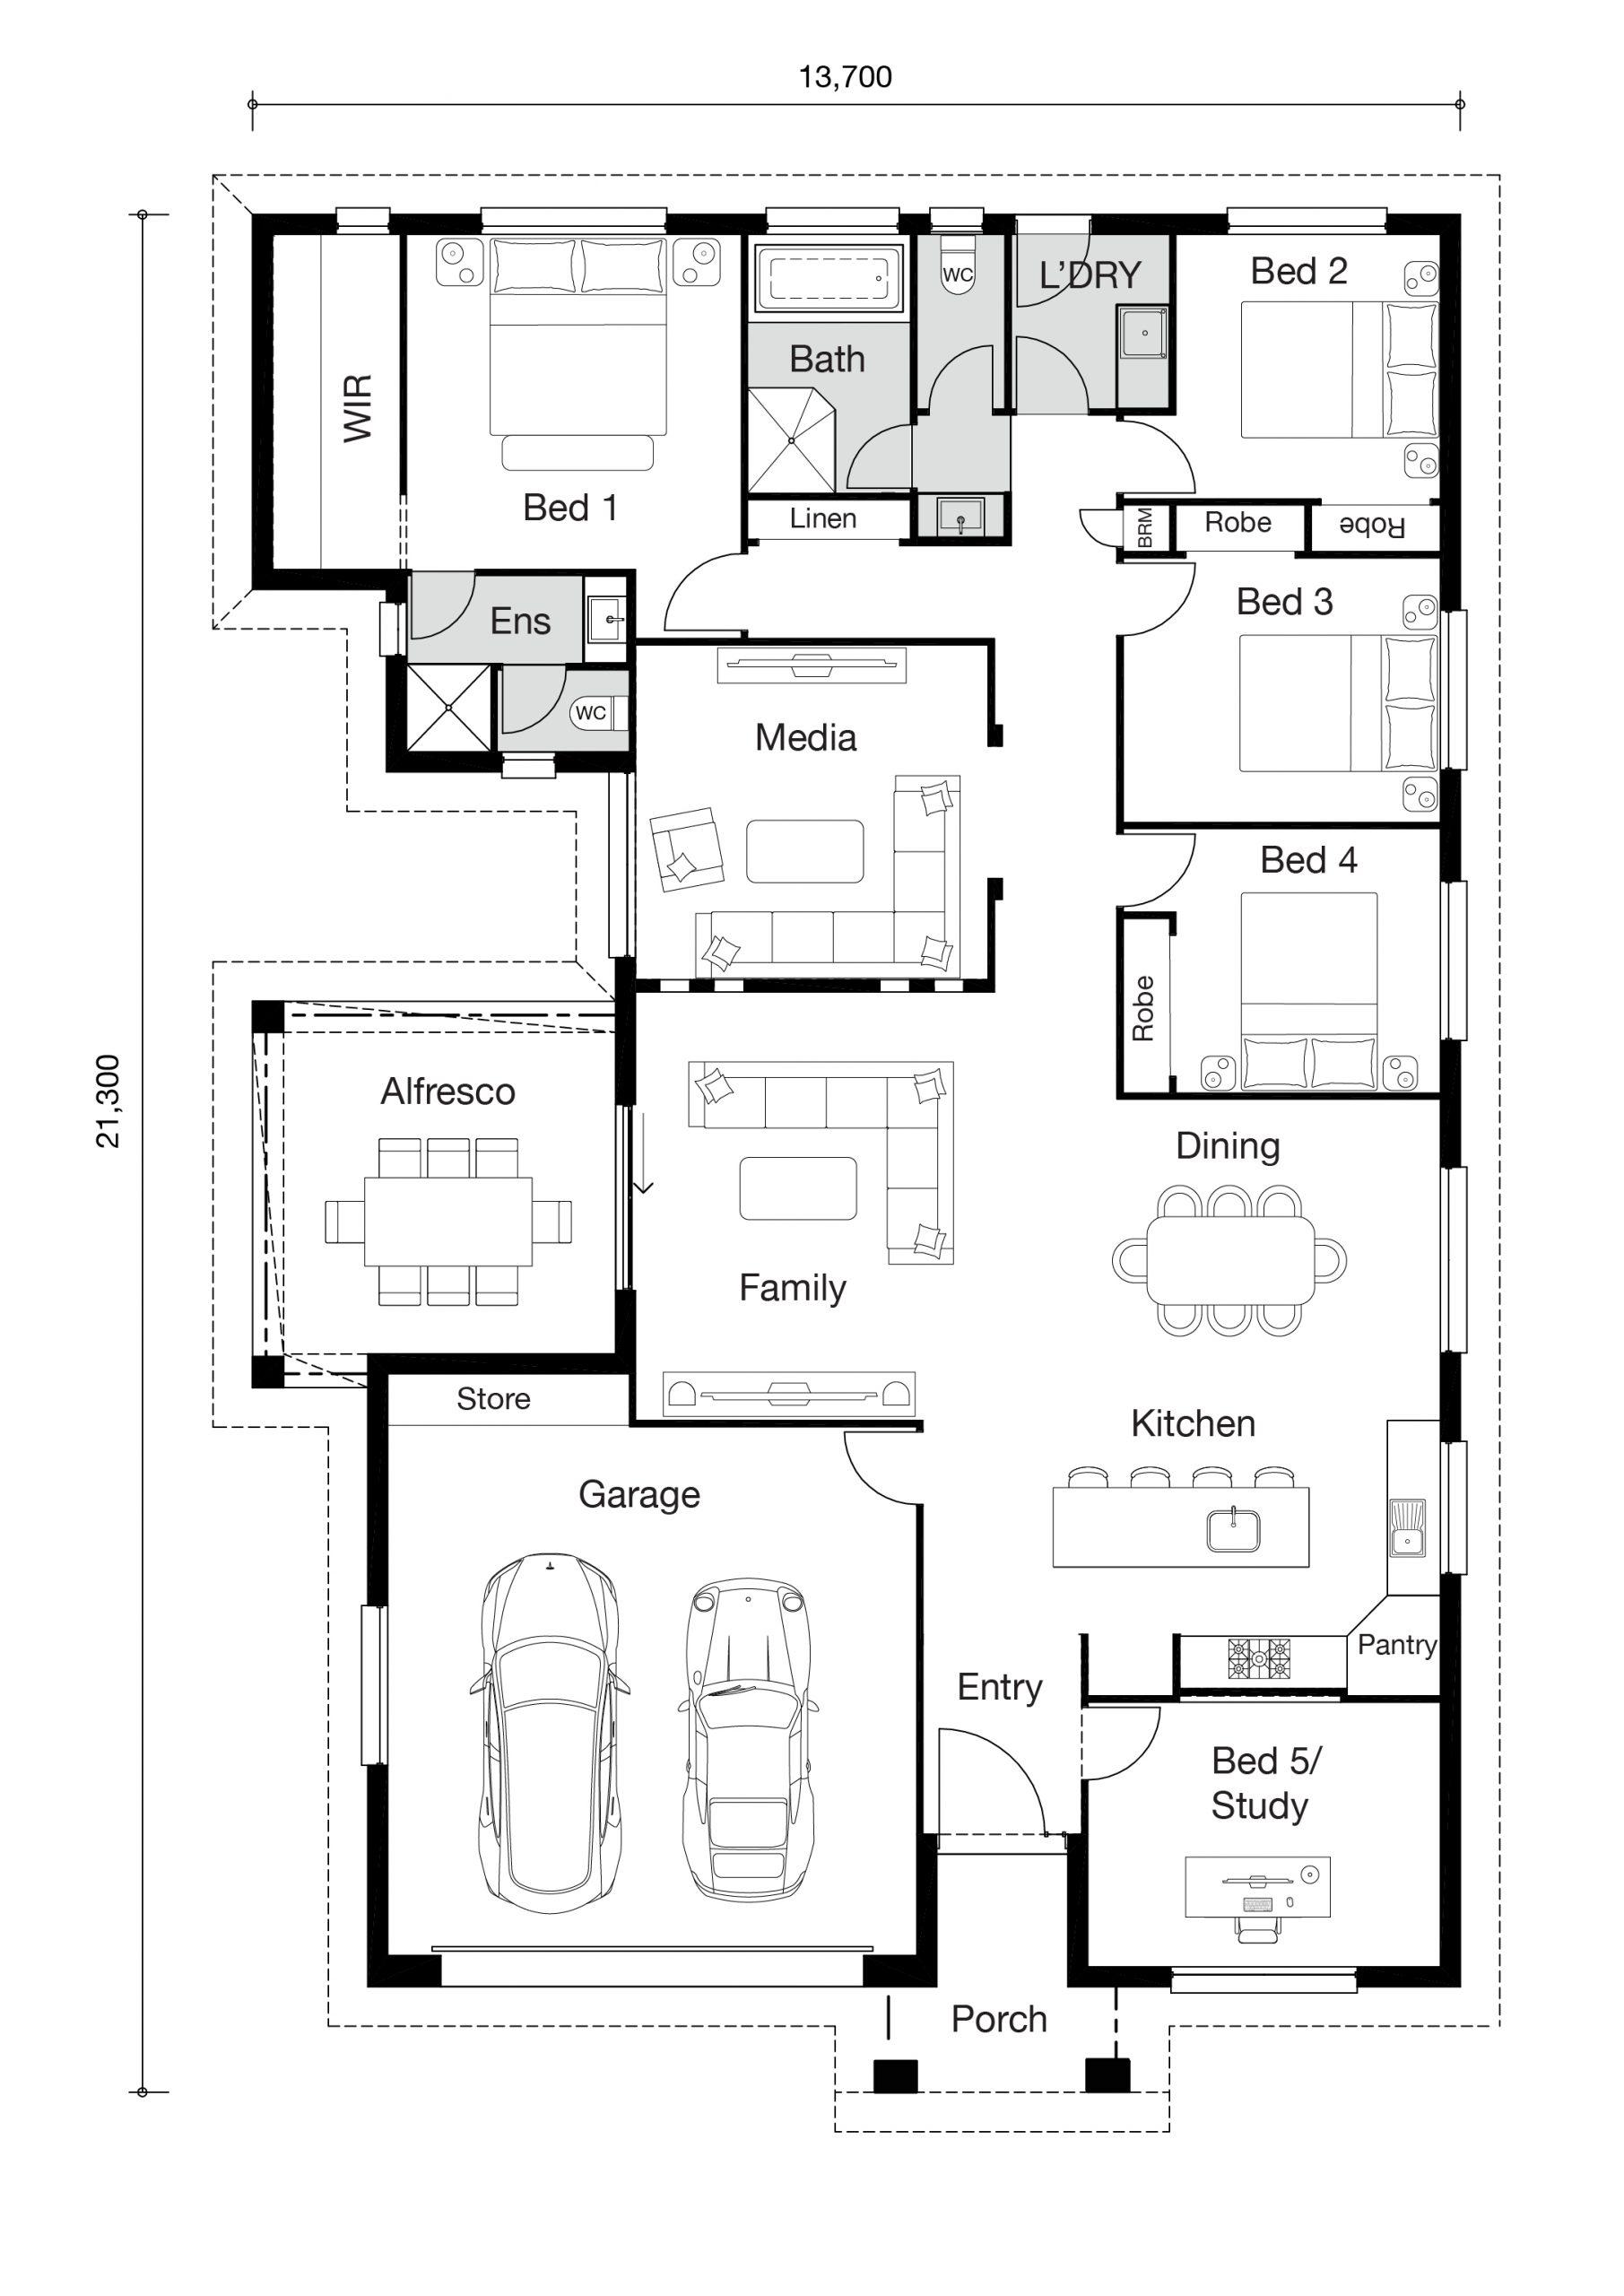 Floor plan for Anjelita home